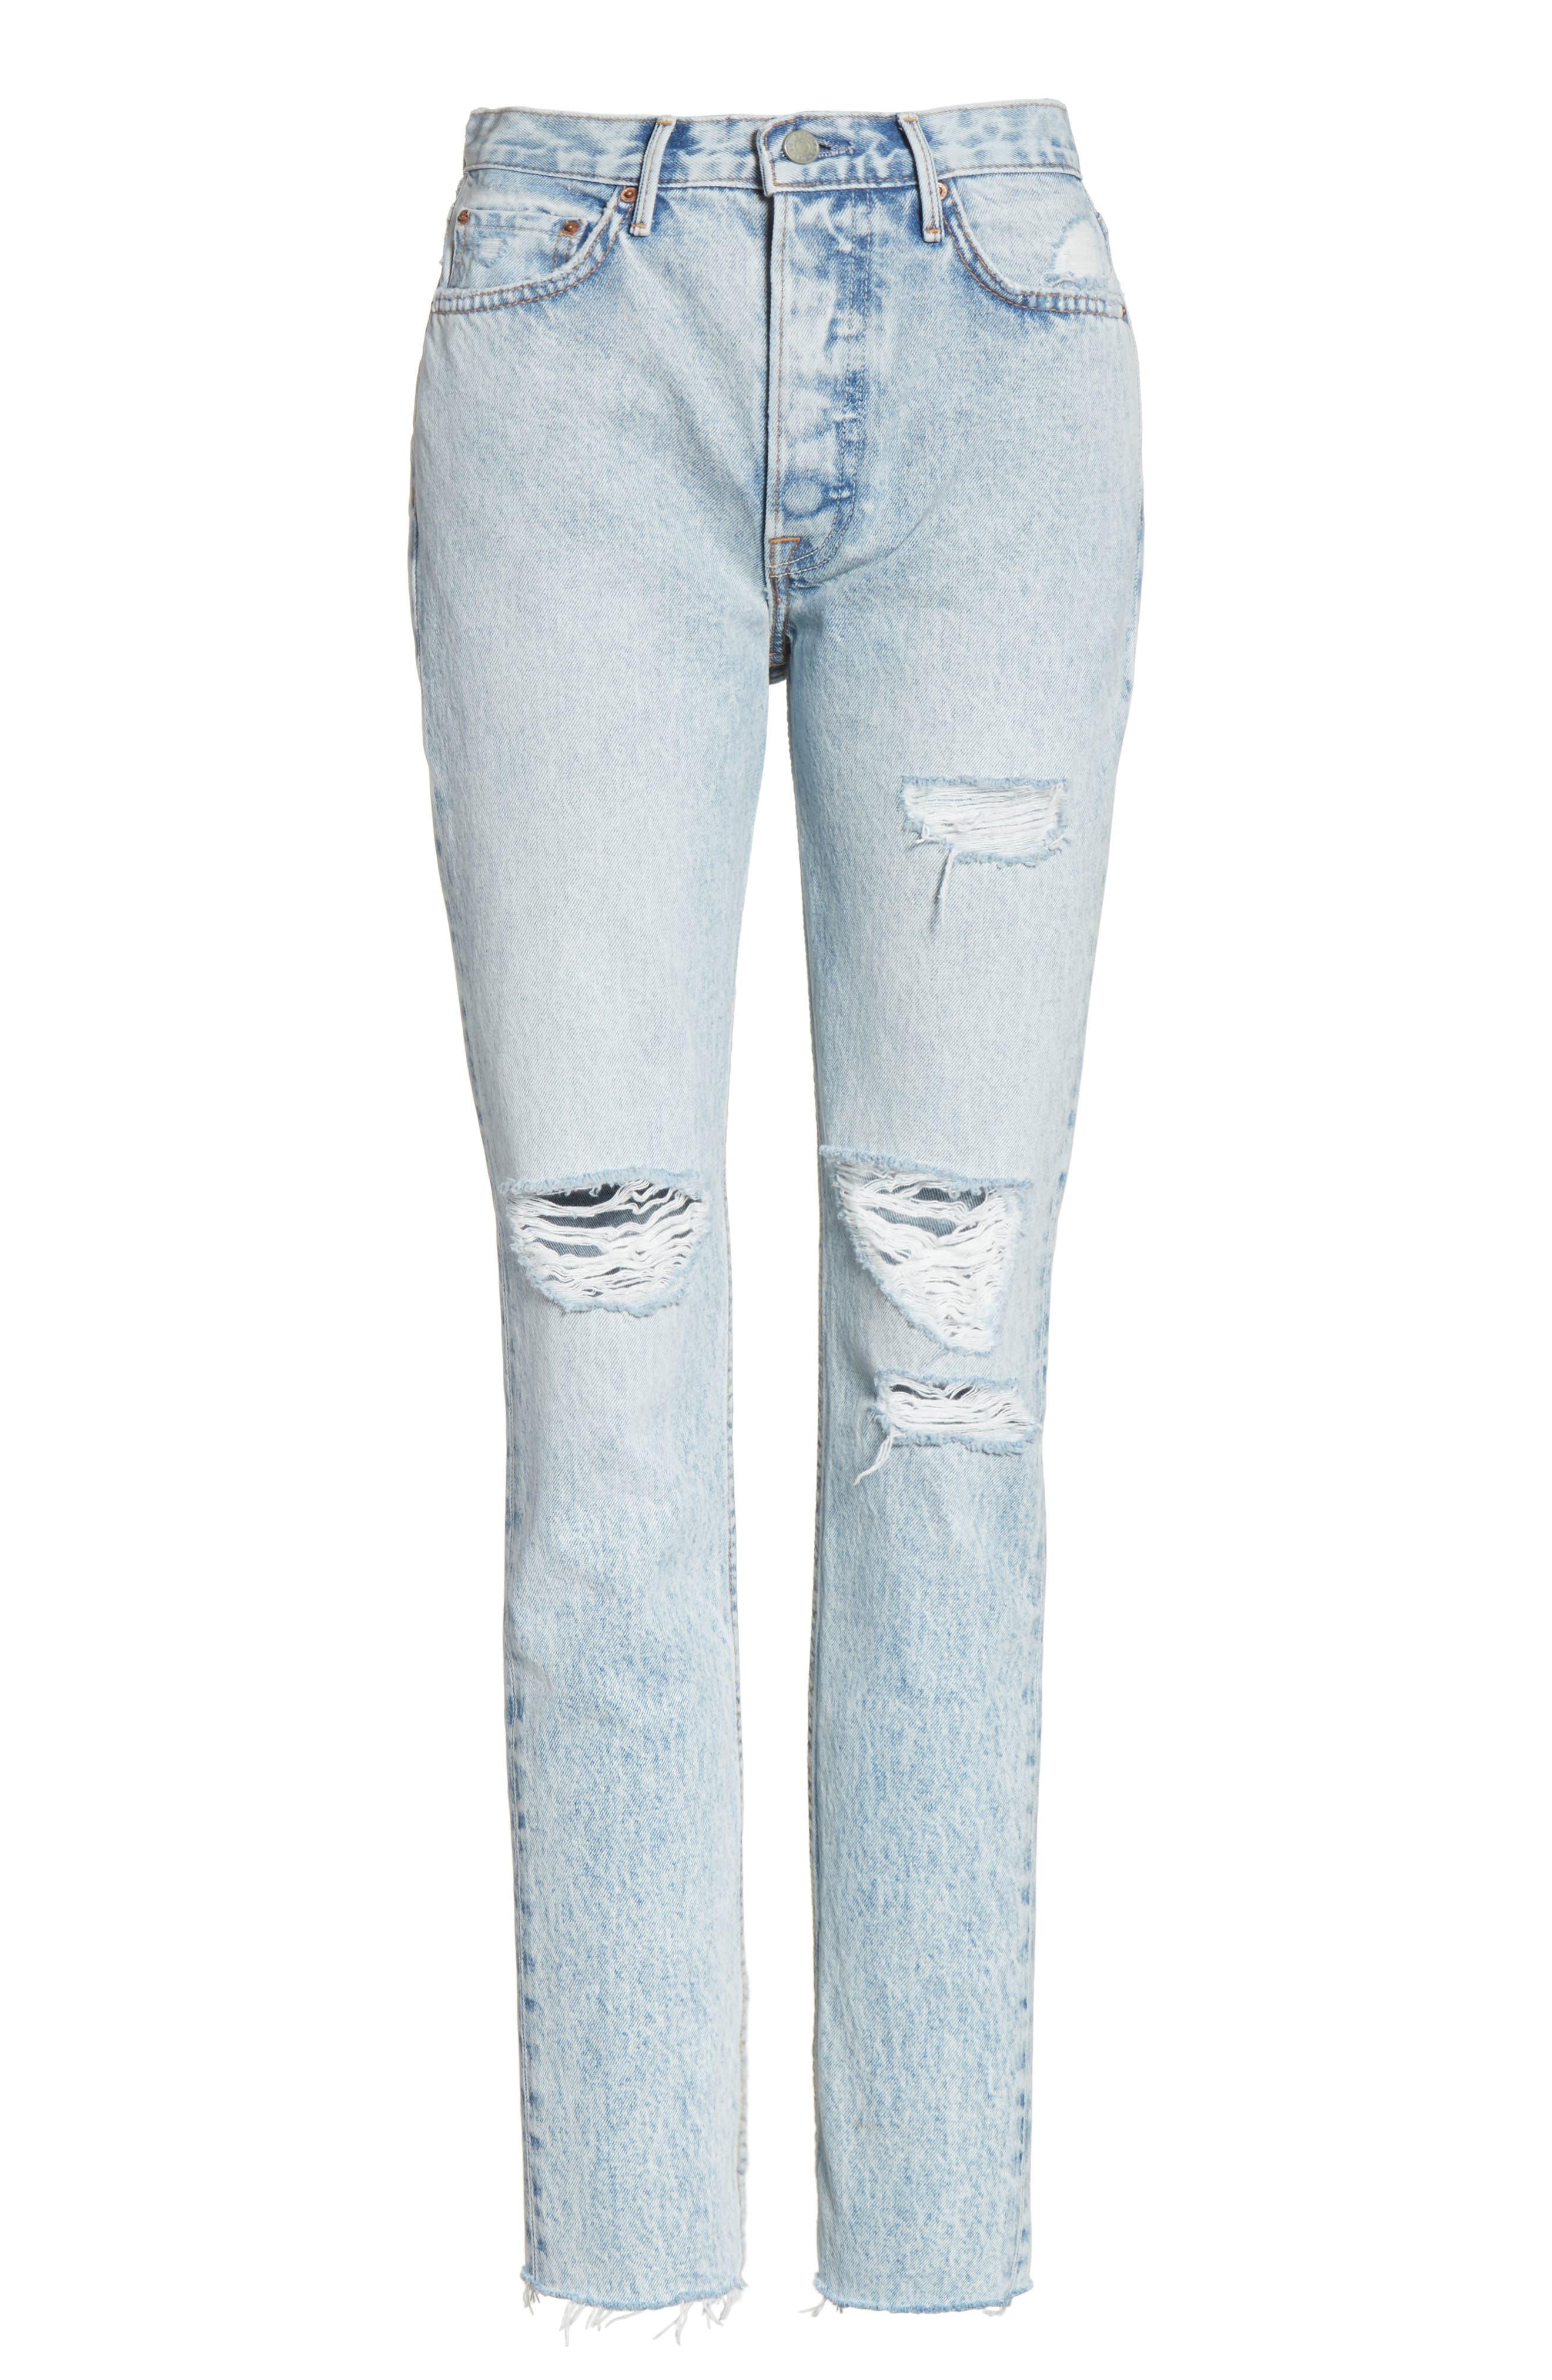 Karolina Ripped Skinny Jeans,                             Alternate thumbnail 6, color,                             Reactive